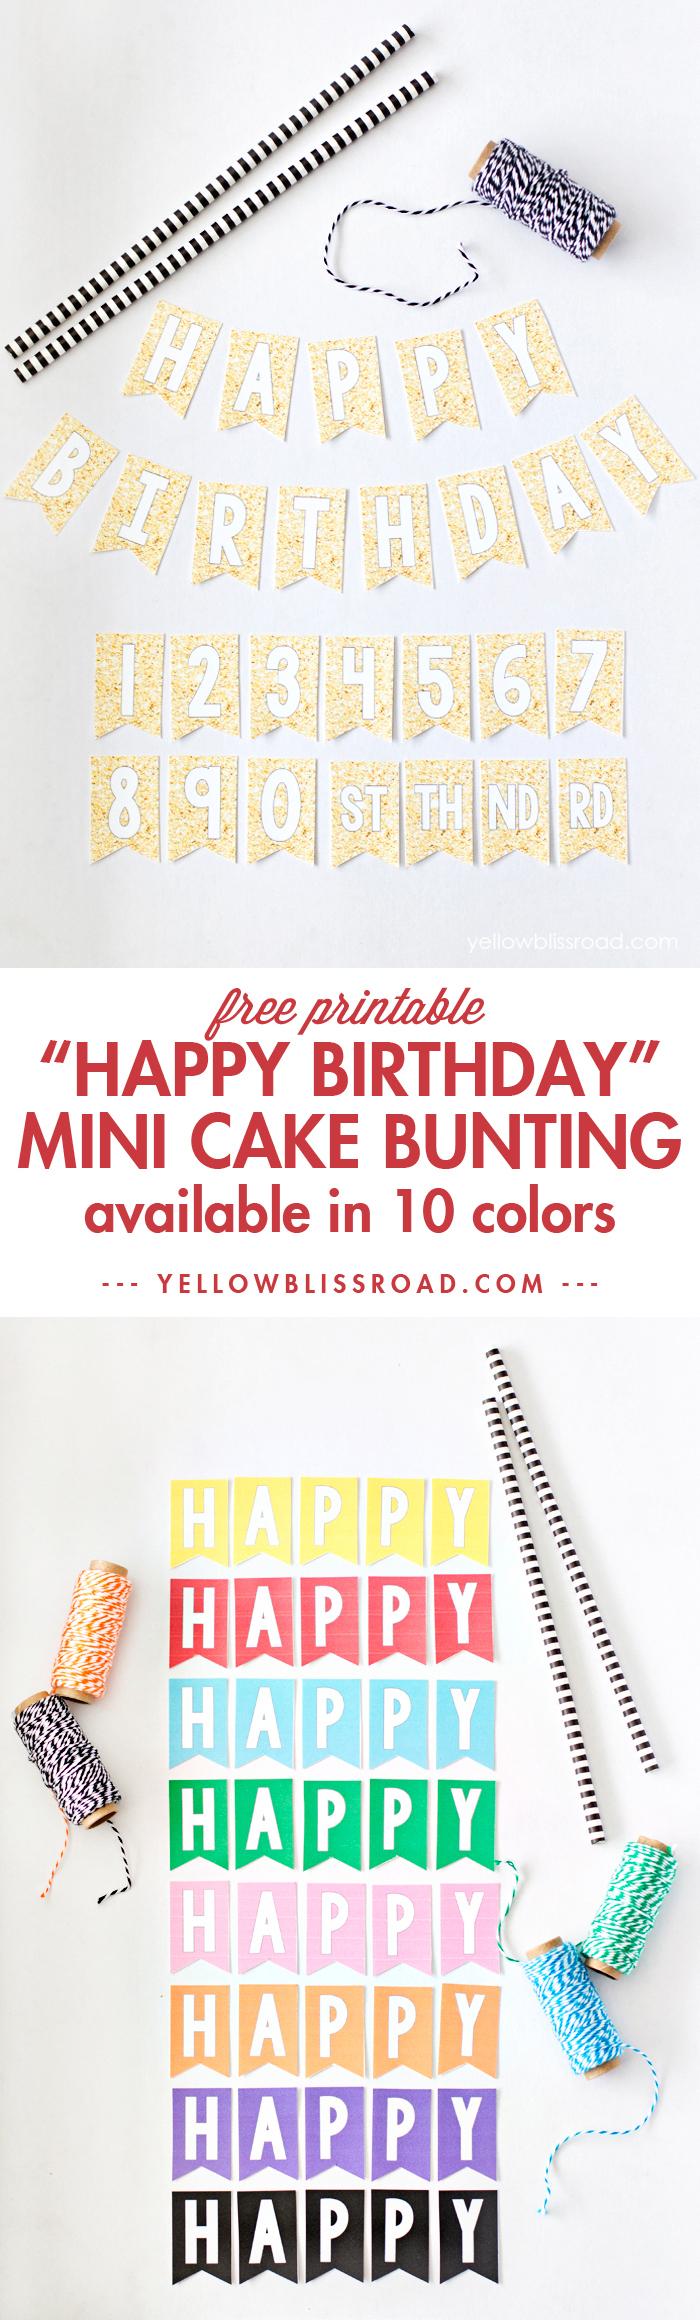 Free Printable Mini Birthday Bunting - Yellow Bliss Road - Free Printable Birthday Cake